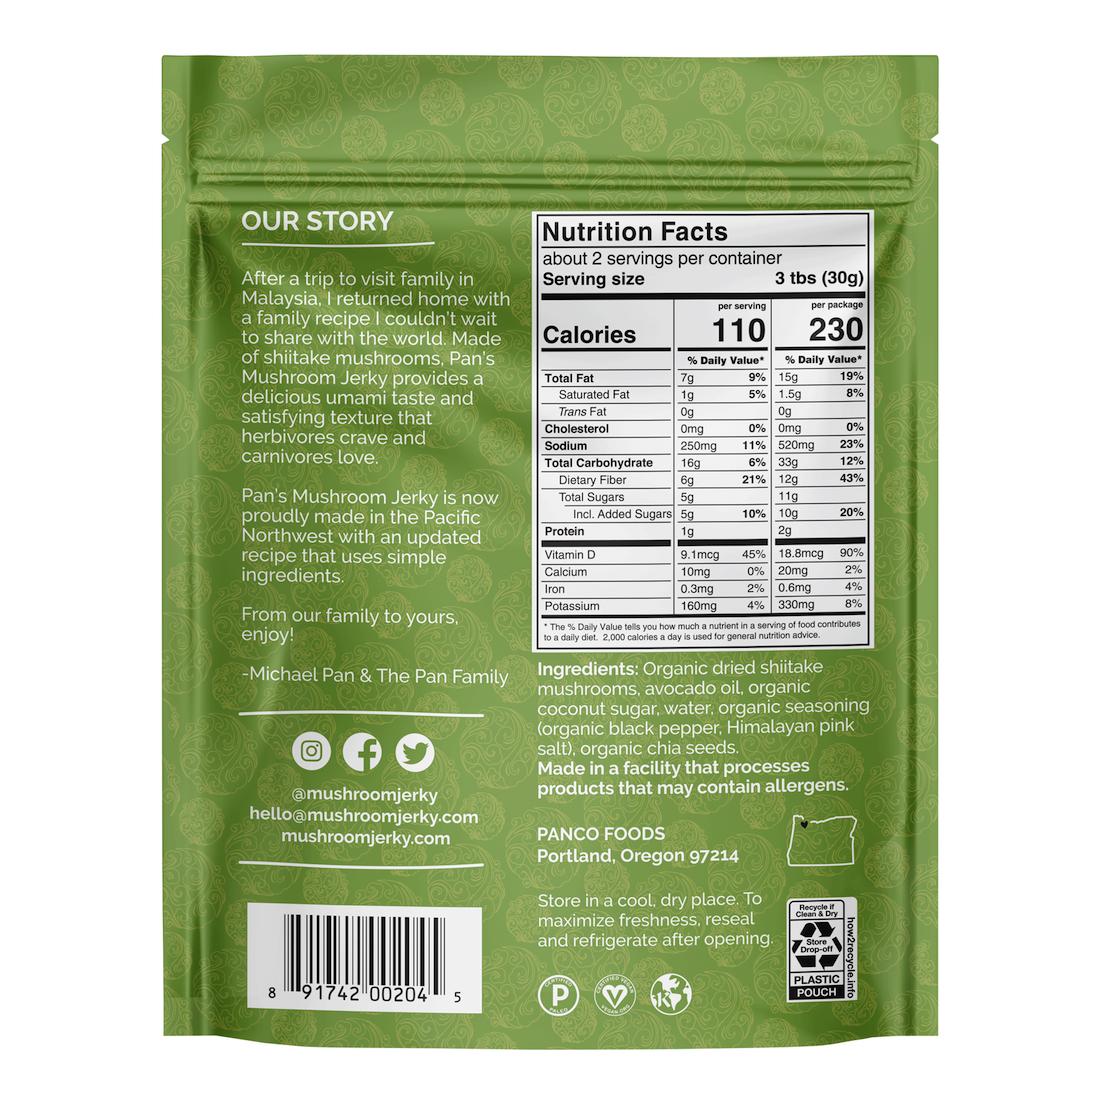 Salt & Pepper NI - Pan's Mushroom Jerky - Certified Paleo, PaleoVegan by the Paleo Foundation